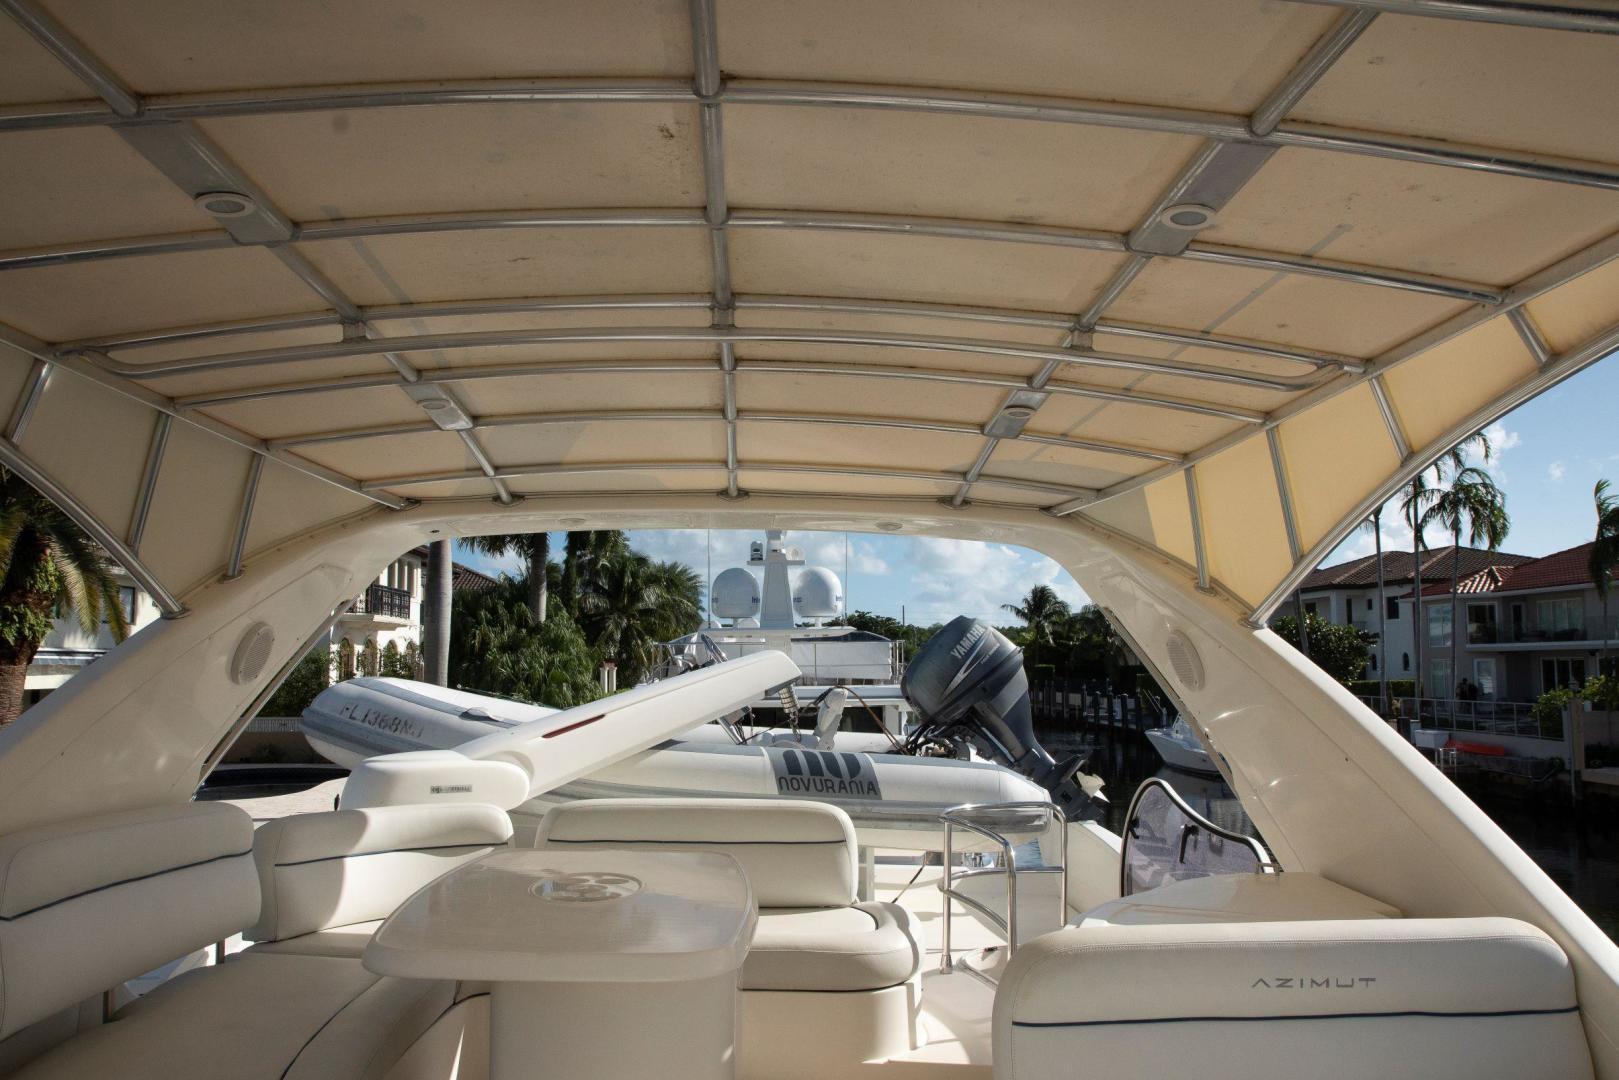 Azimut 2004-Copasetic North Miami Beach-Florida-United States-1619875 | Thumbnail